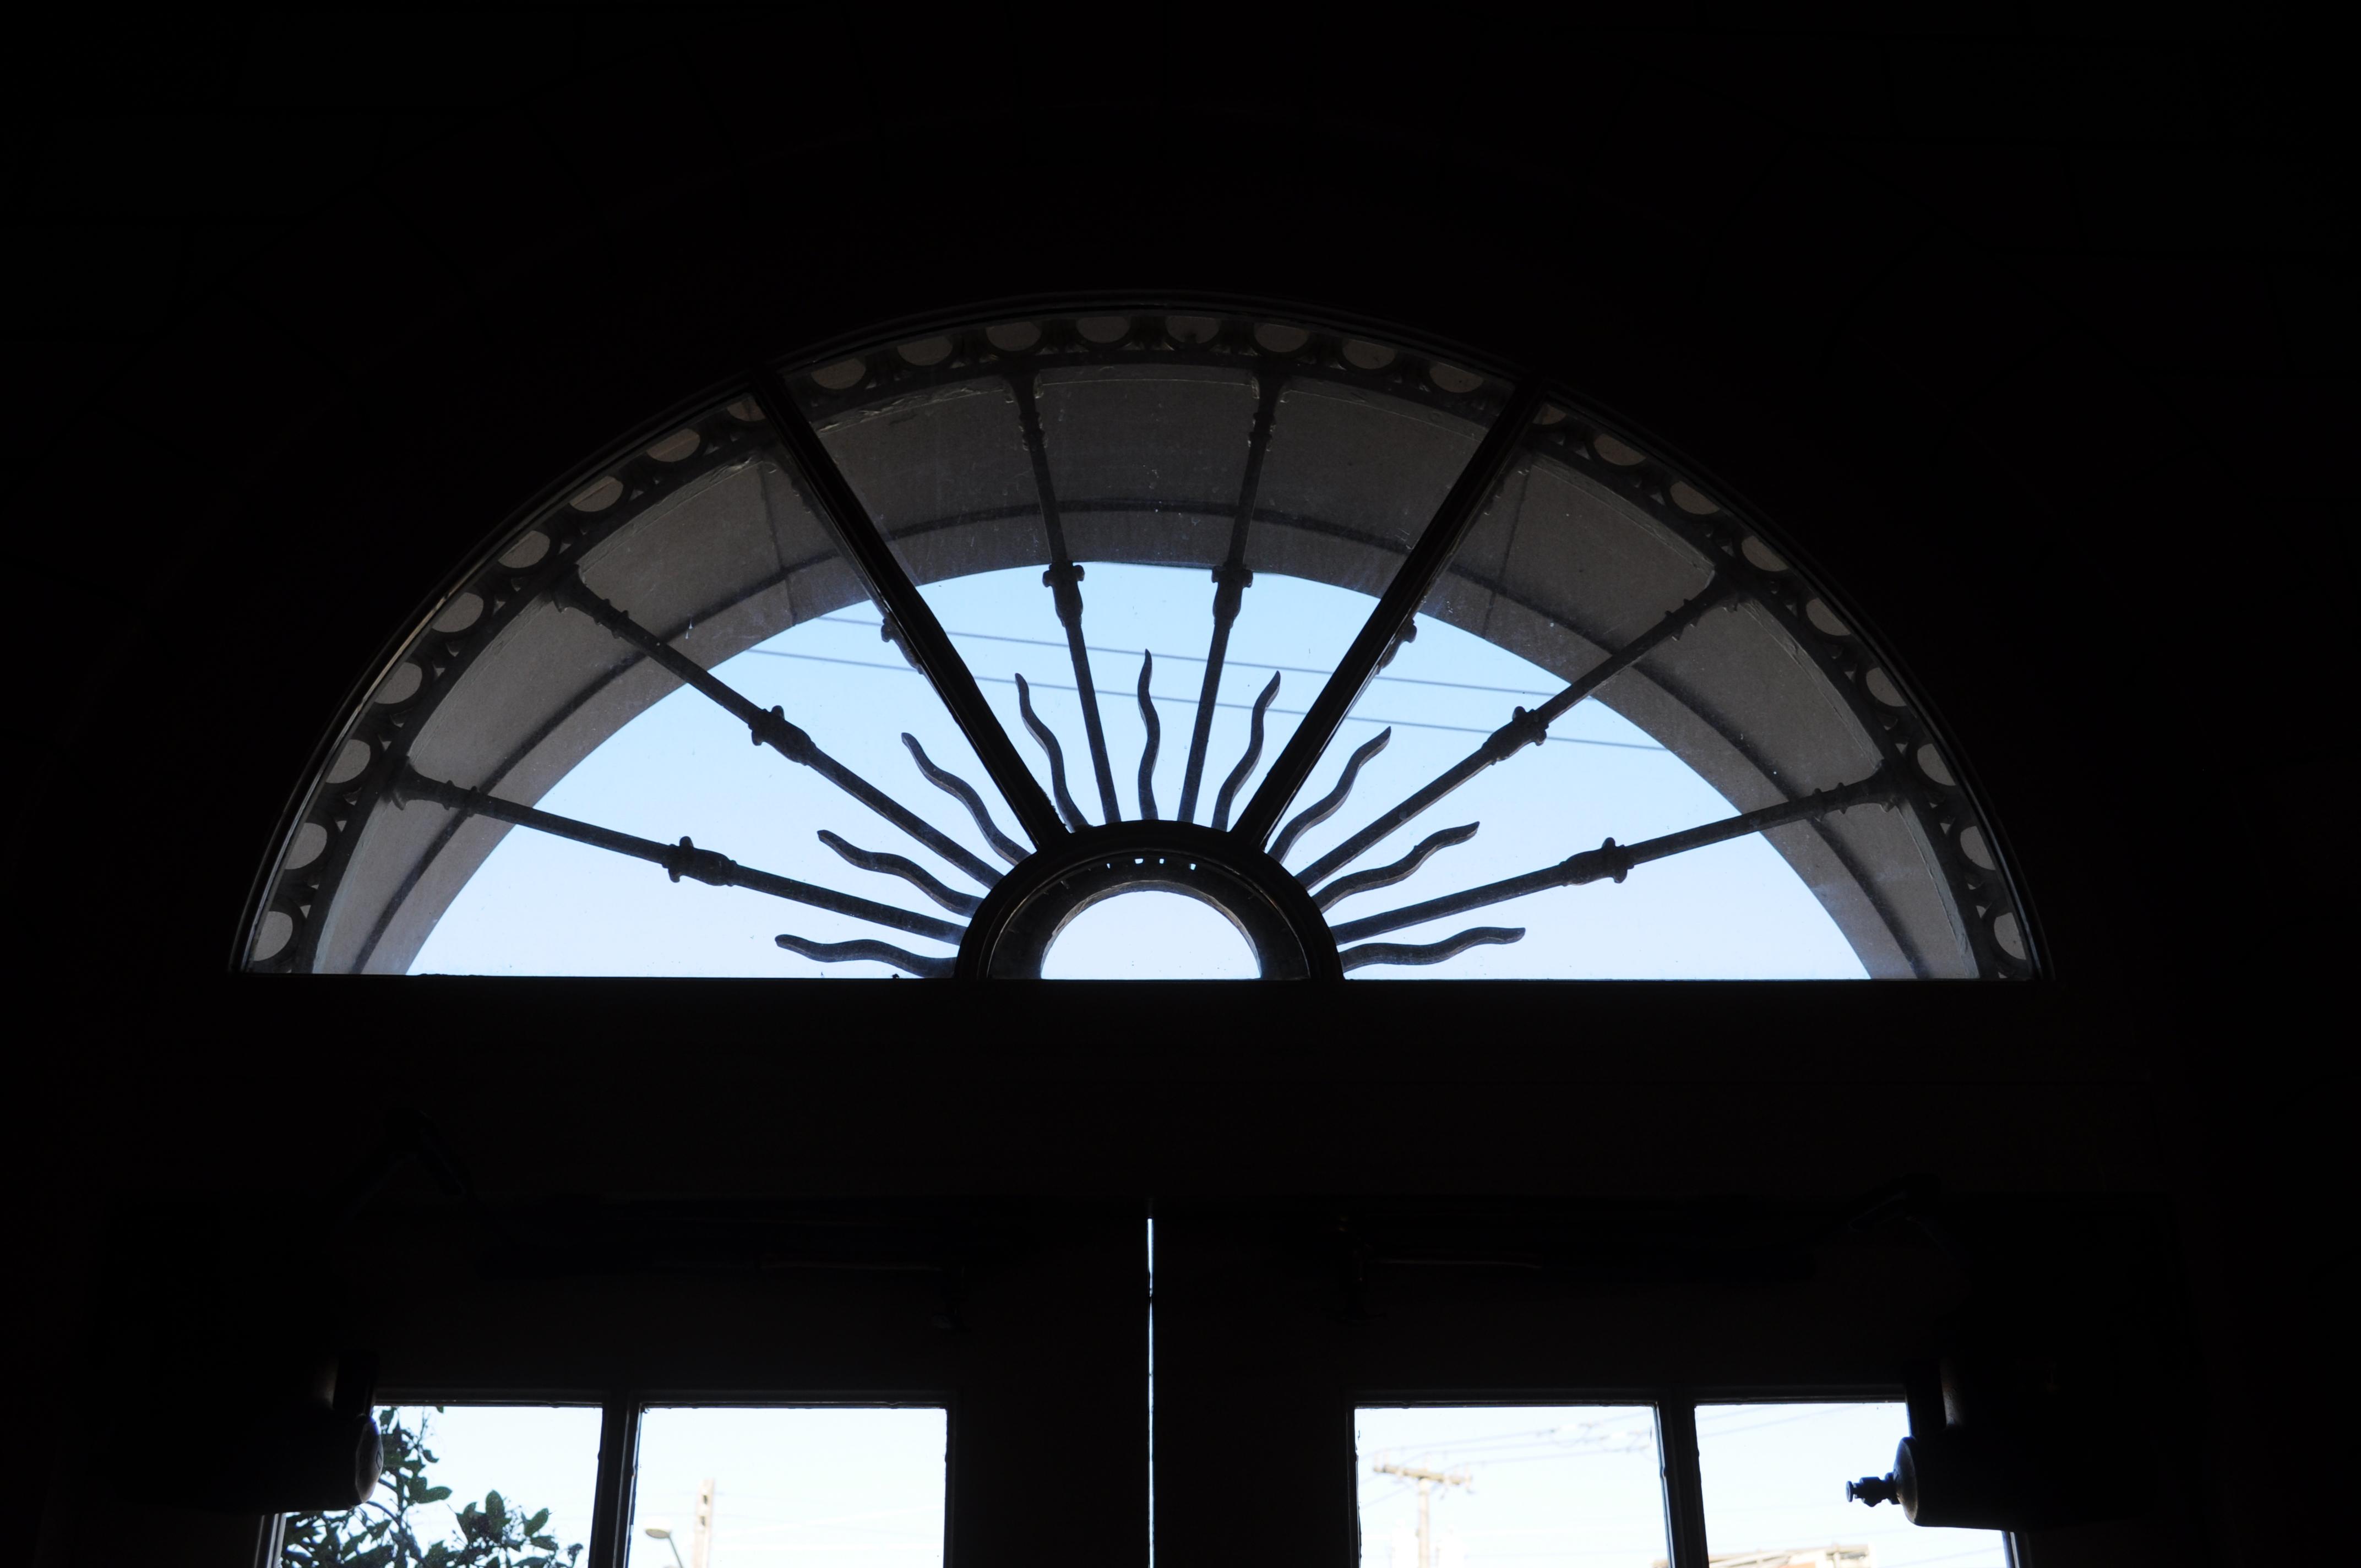 sunburst windows